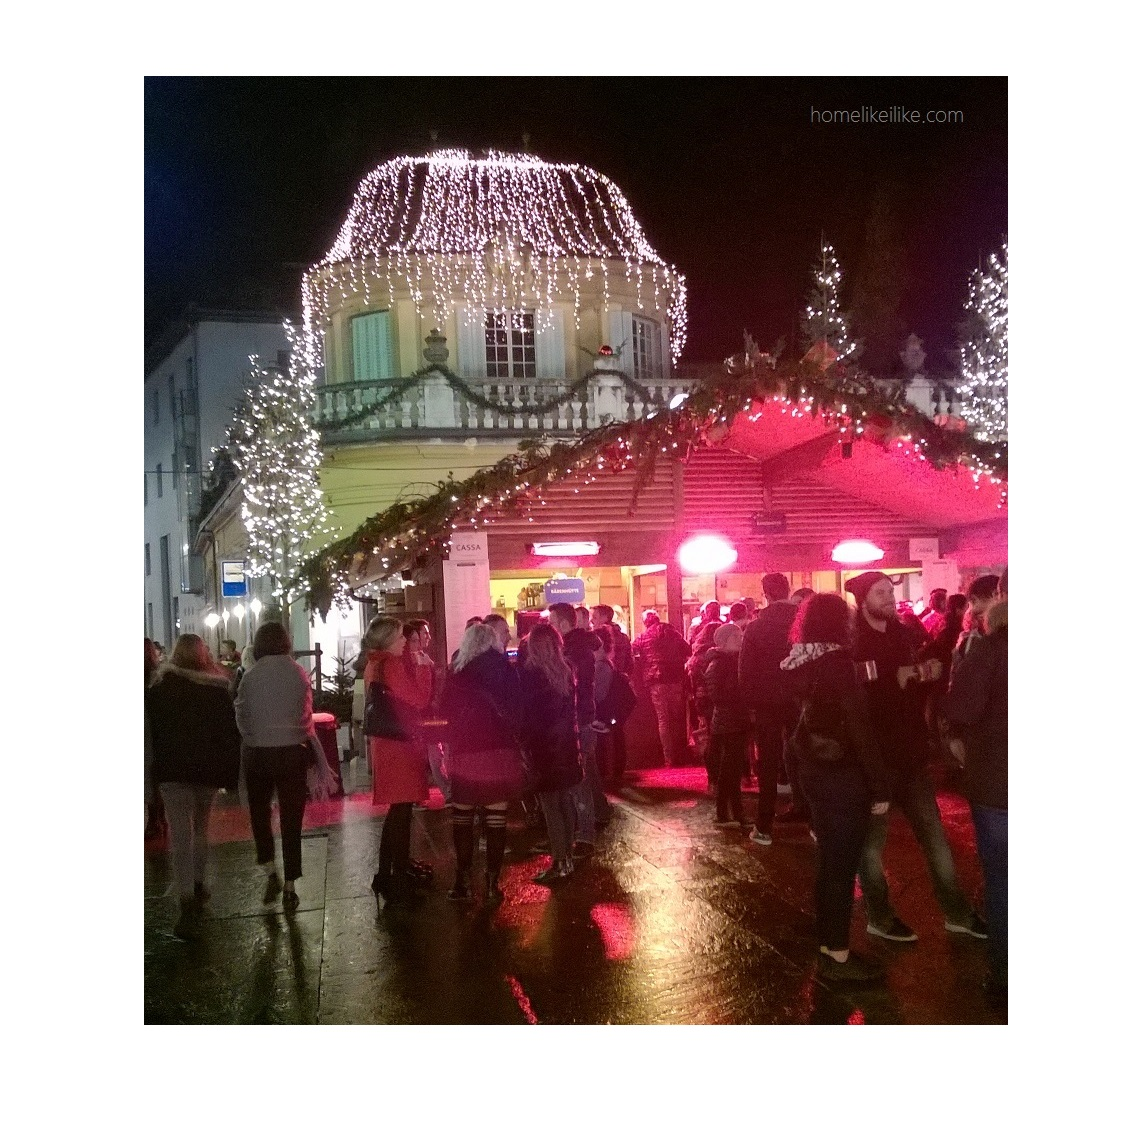 Bolzano - Piazza Walther - homelikeilike.com